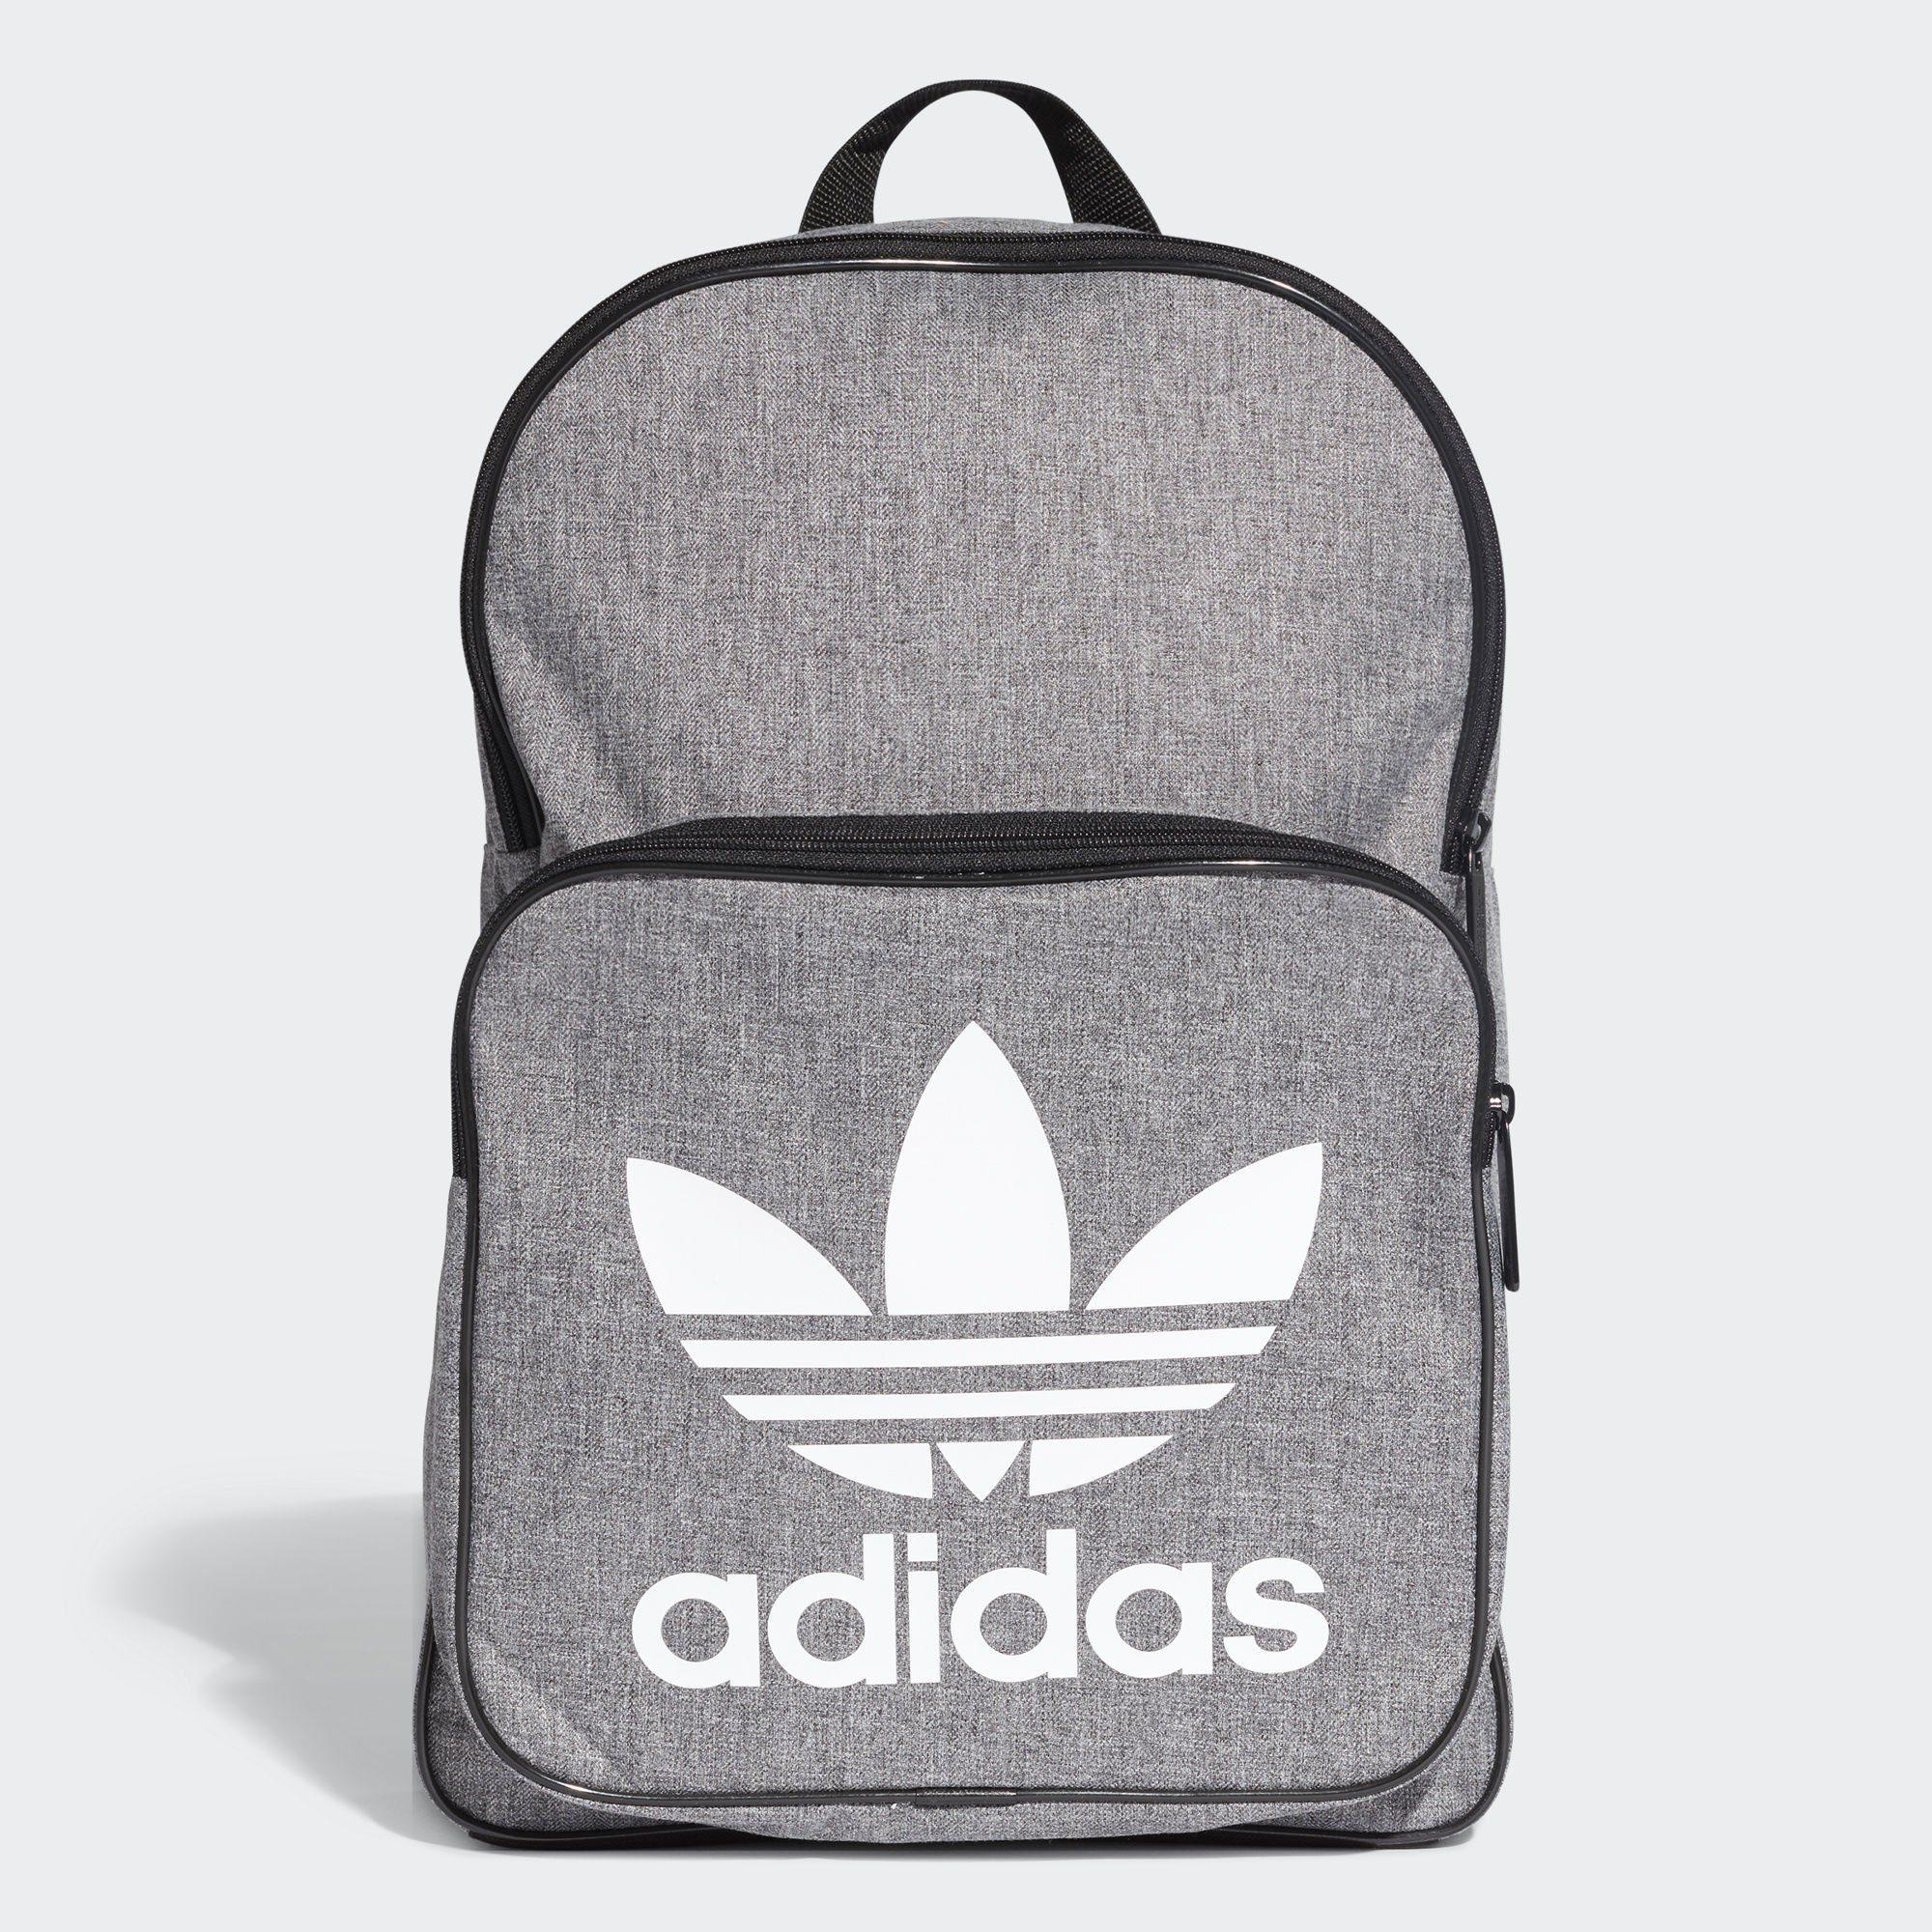 adidas Originals Sporttasche »Trefoil Casual Rucksack«